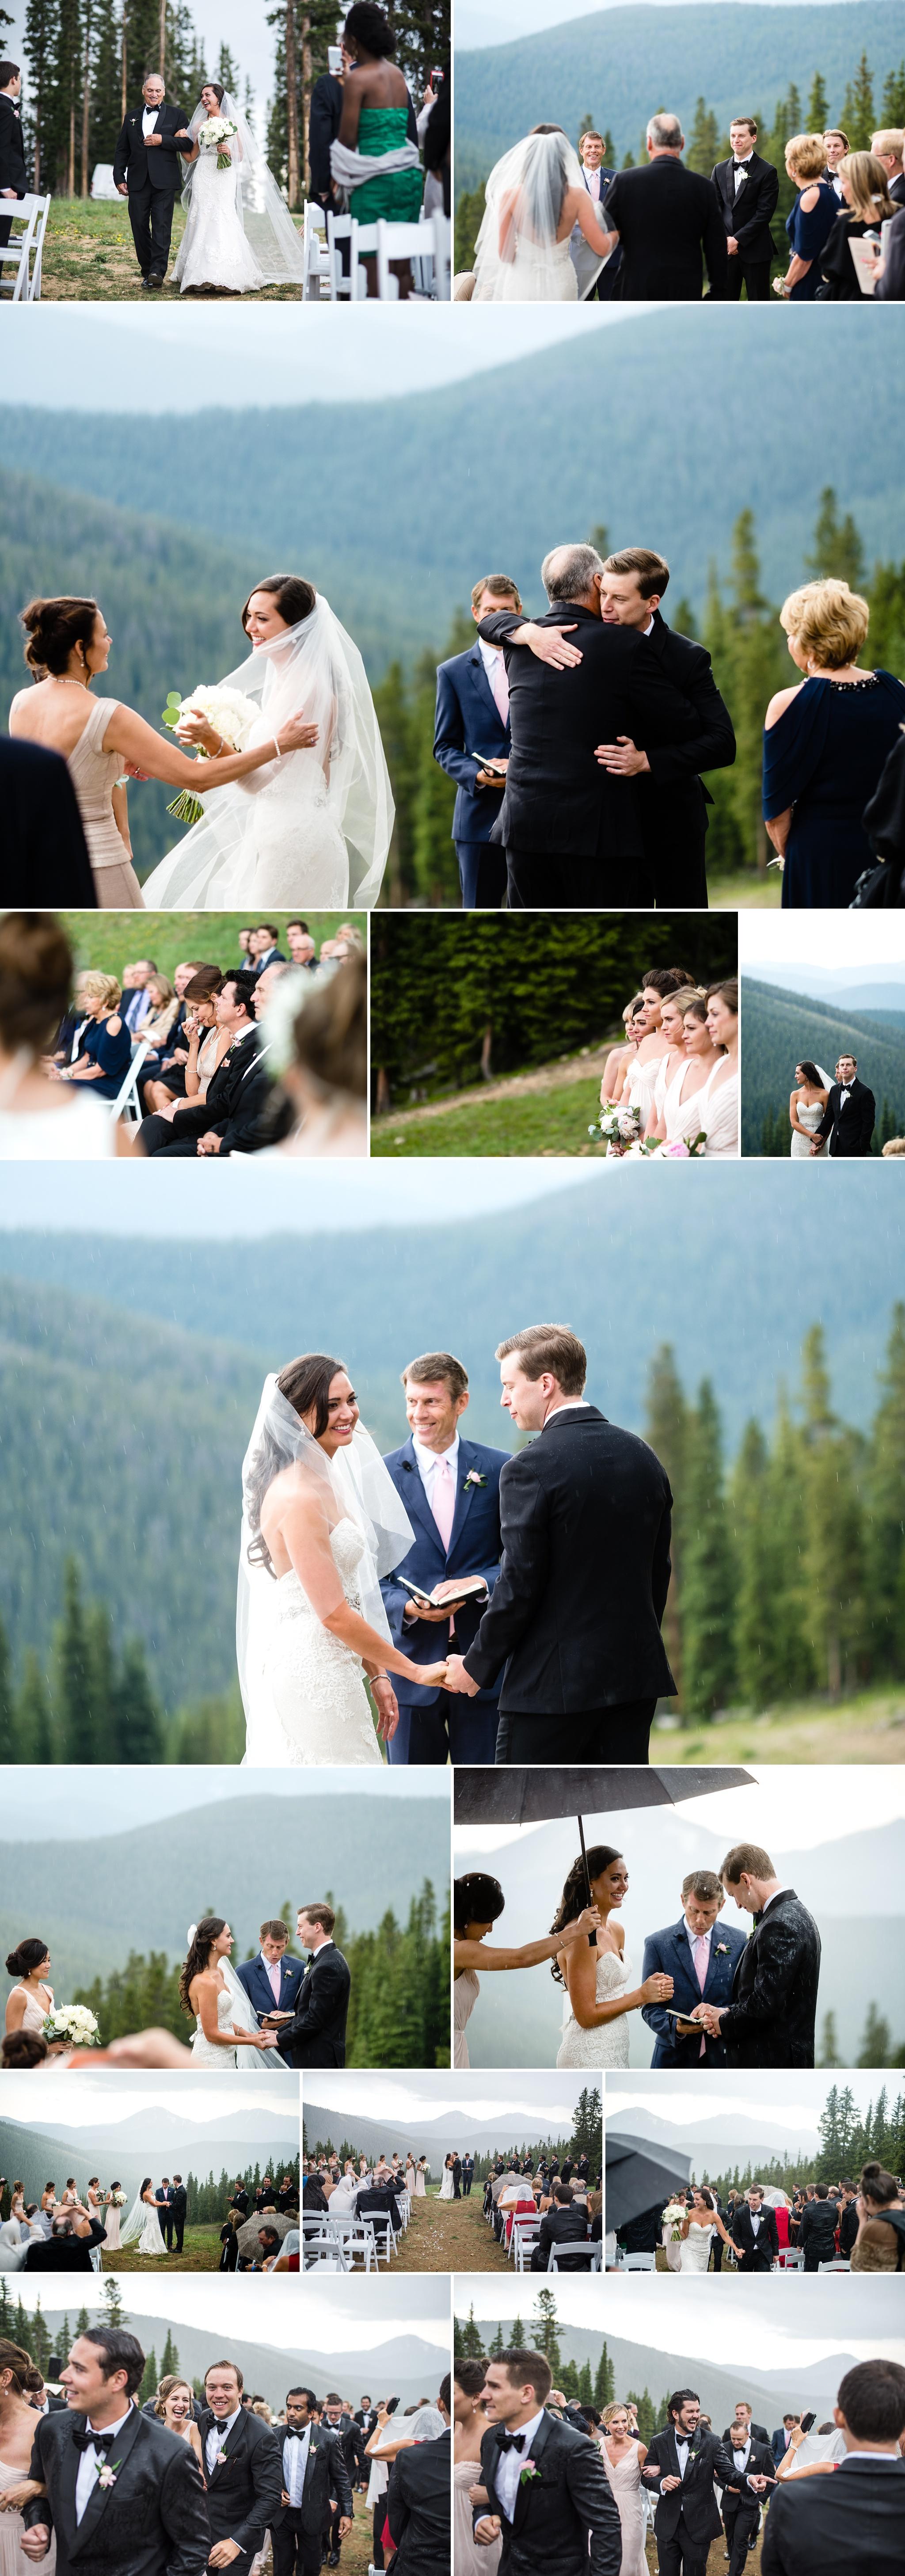 Timber Ridge Lodge Wedding Ceremony by Kate Merrill